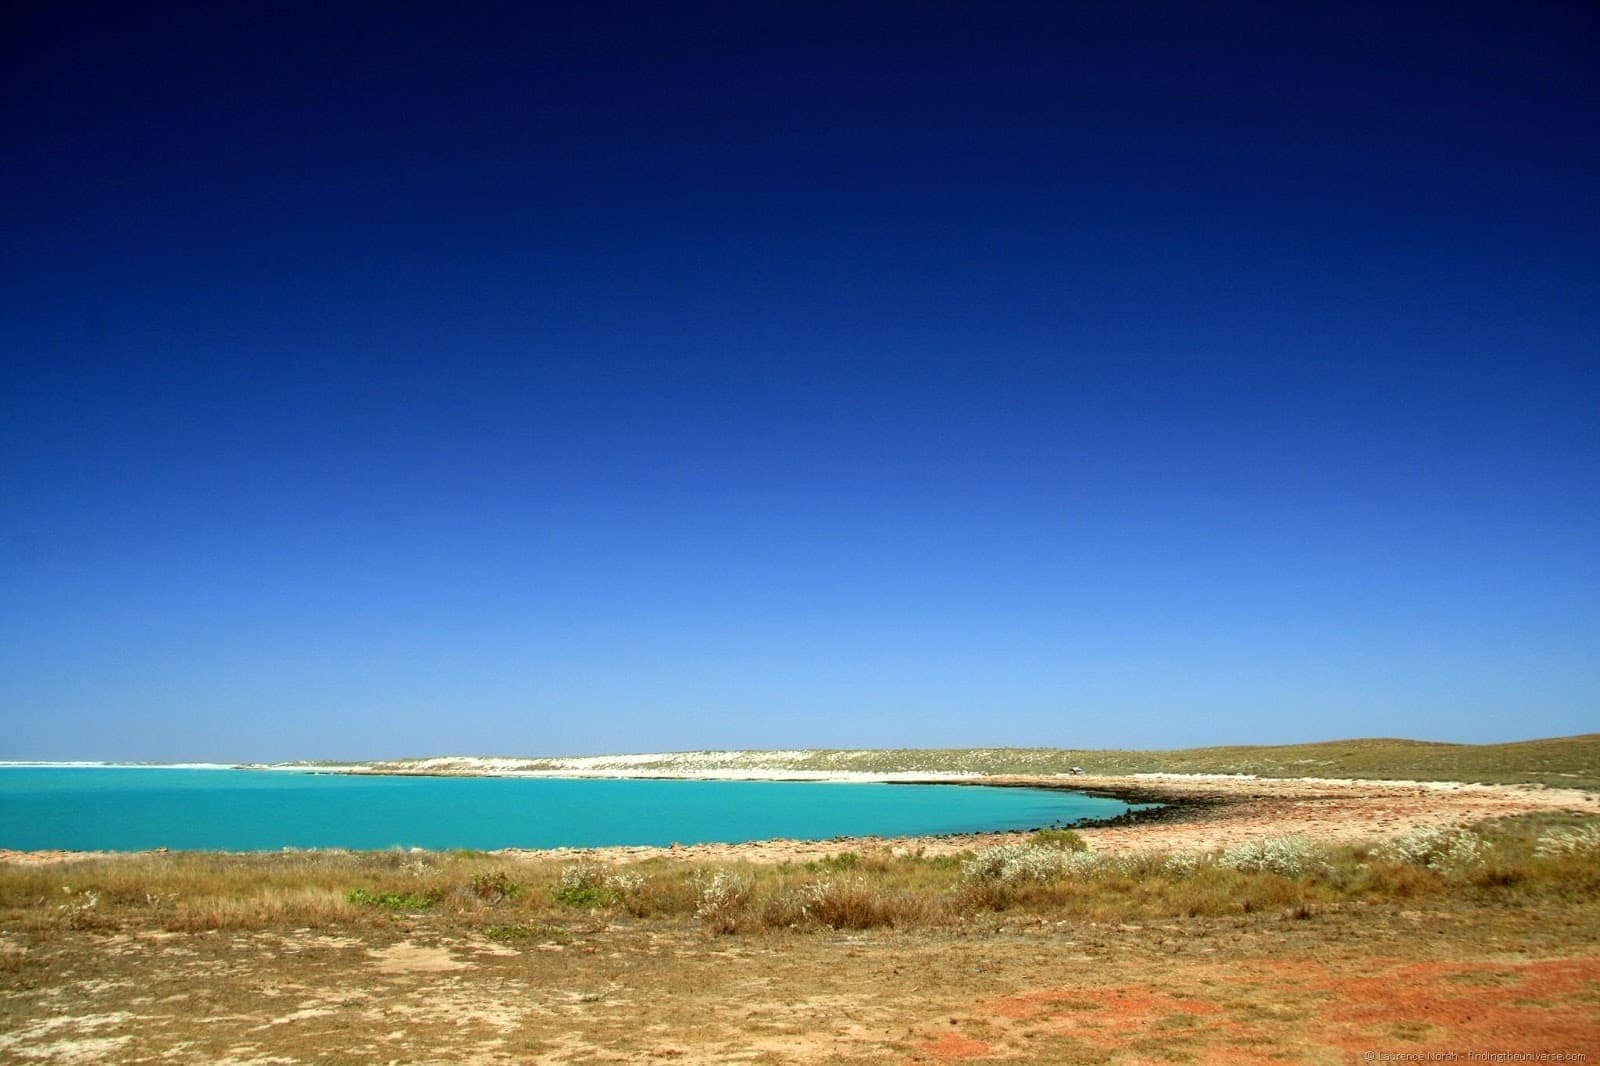 80 mile beach - Western Australia